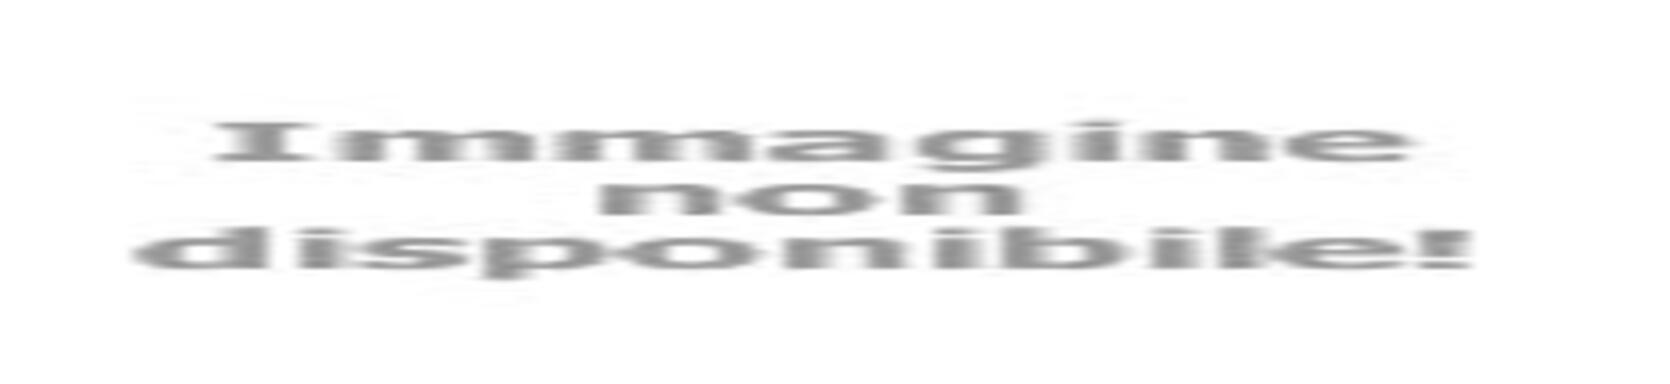 basketriminicrabs it 6-2714-video-eybl-u20-i-tappa-crabs-vs-szolnoki 003